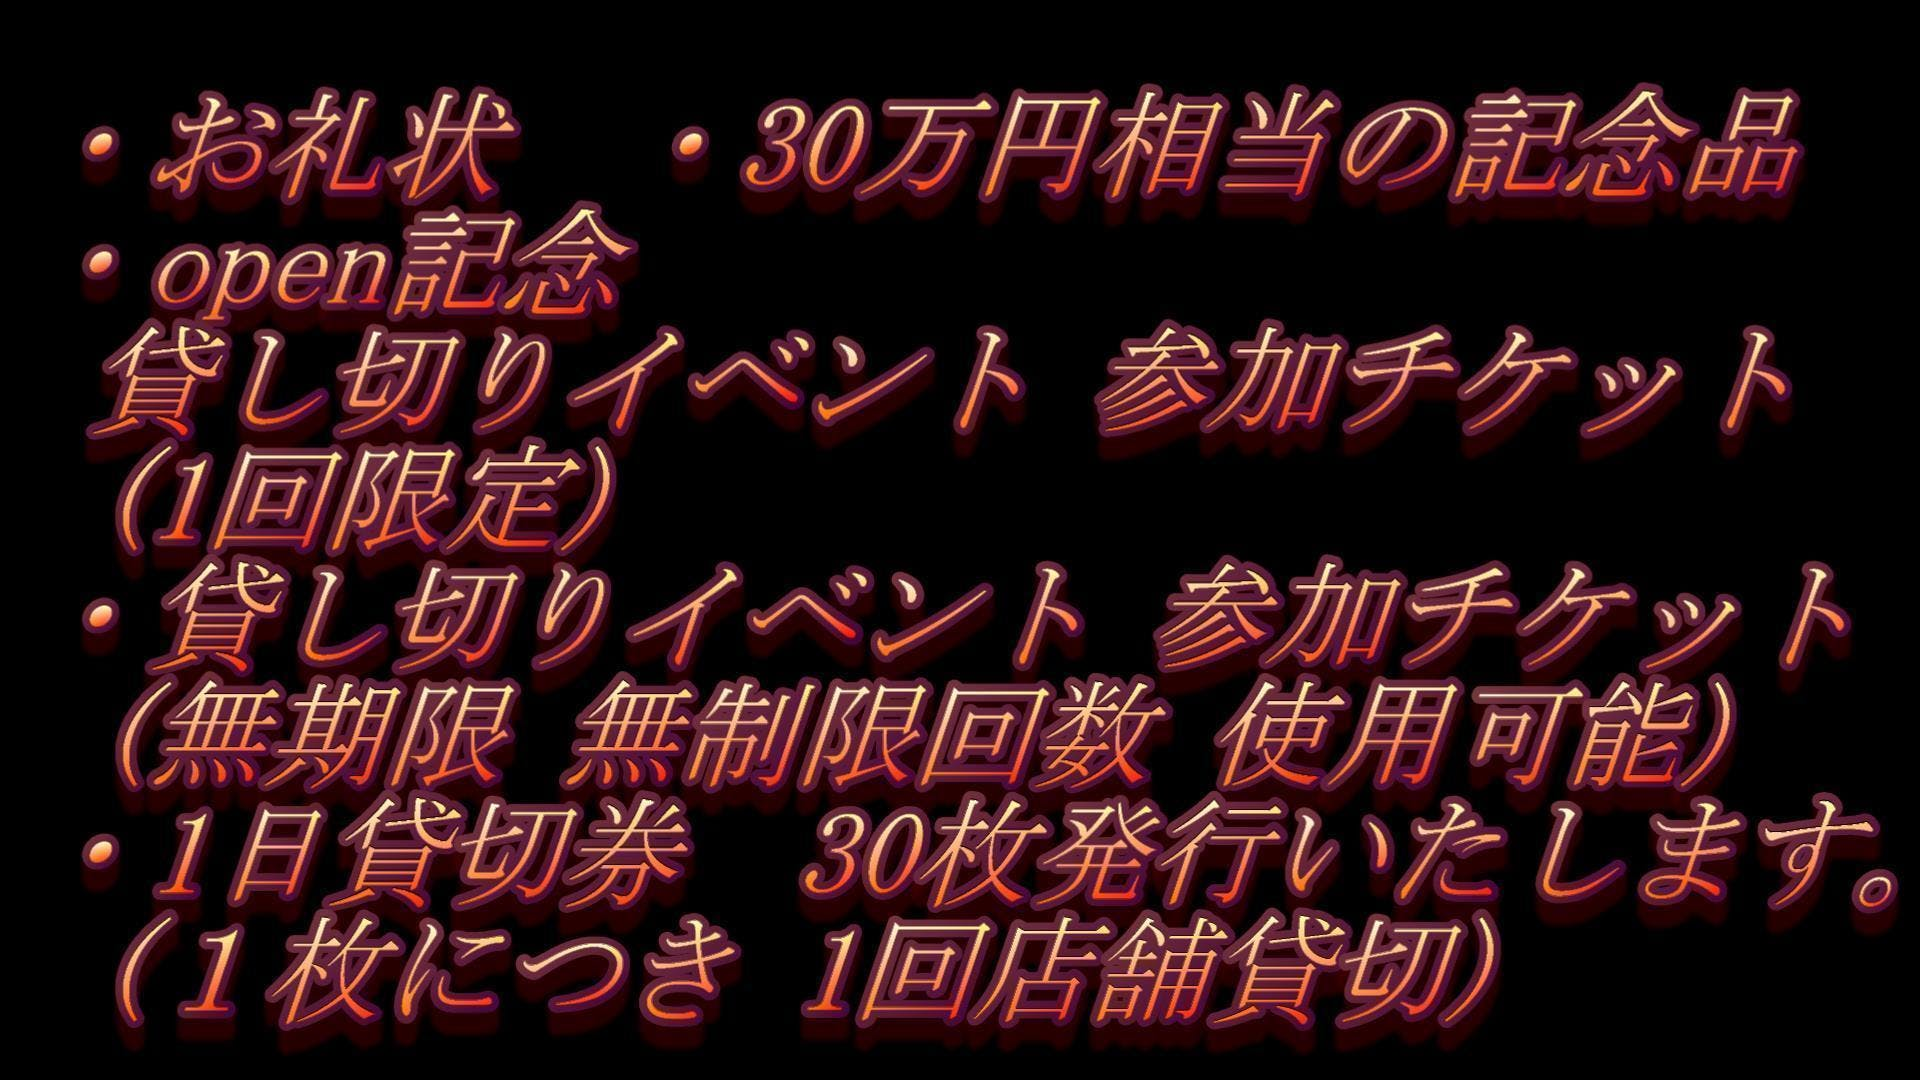 290万円